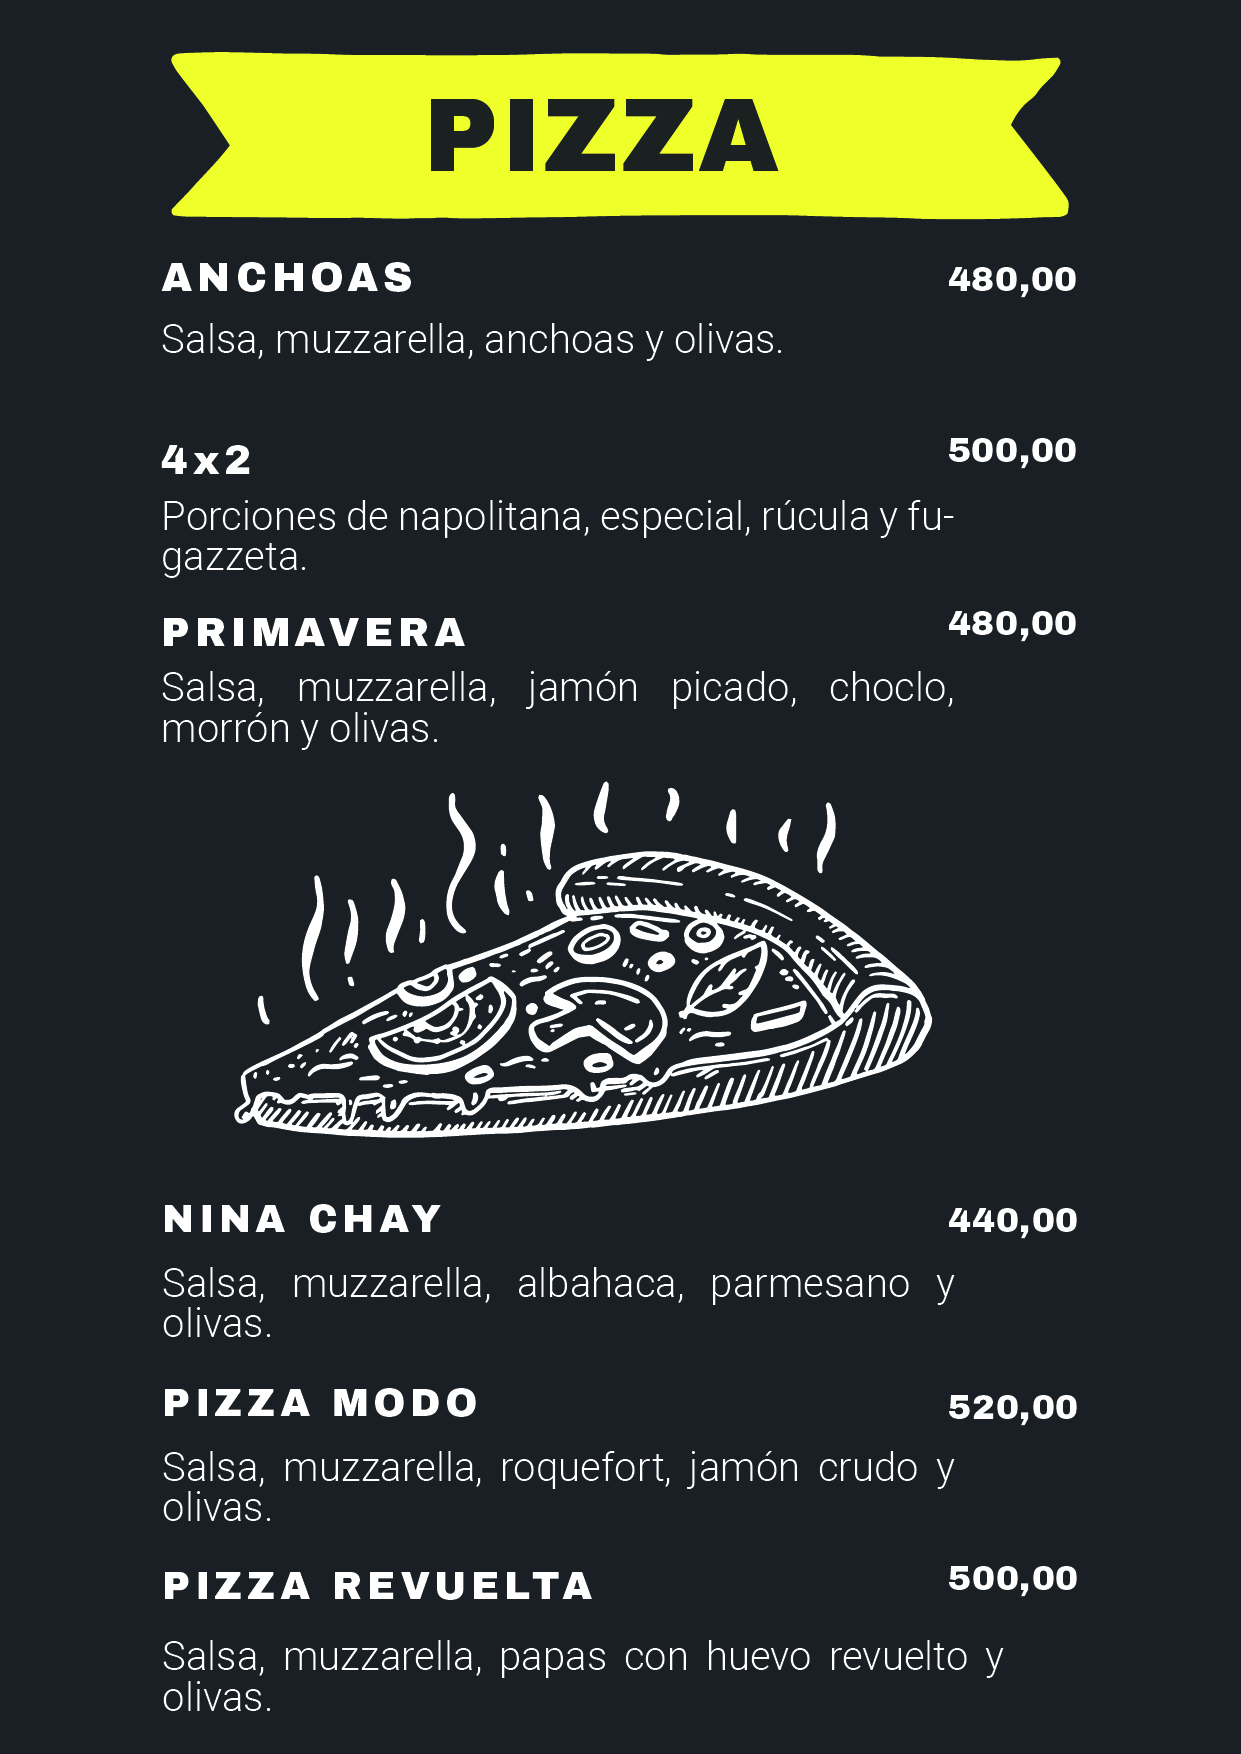 pizzas2 - pizzas2